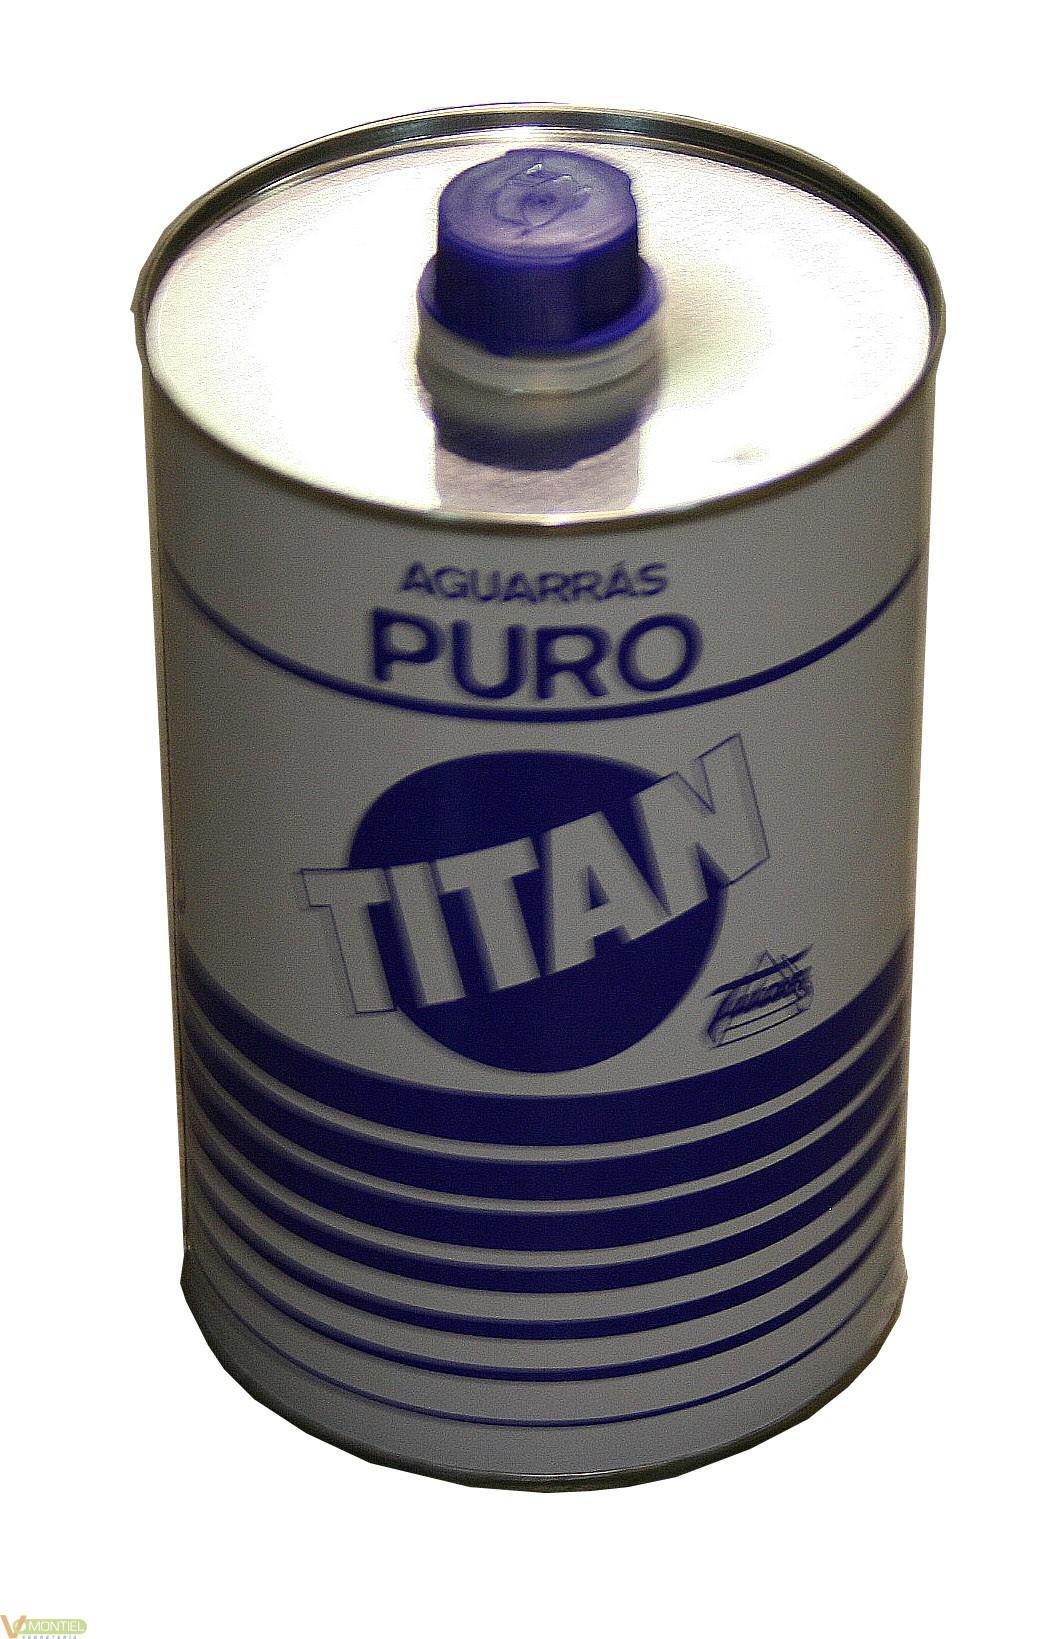 Aguarras puro 1 lt titan-0